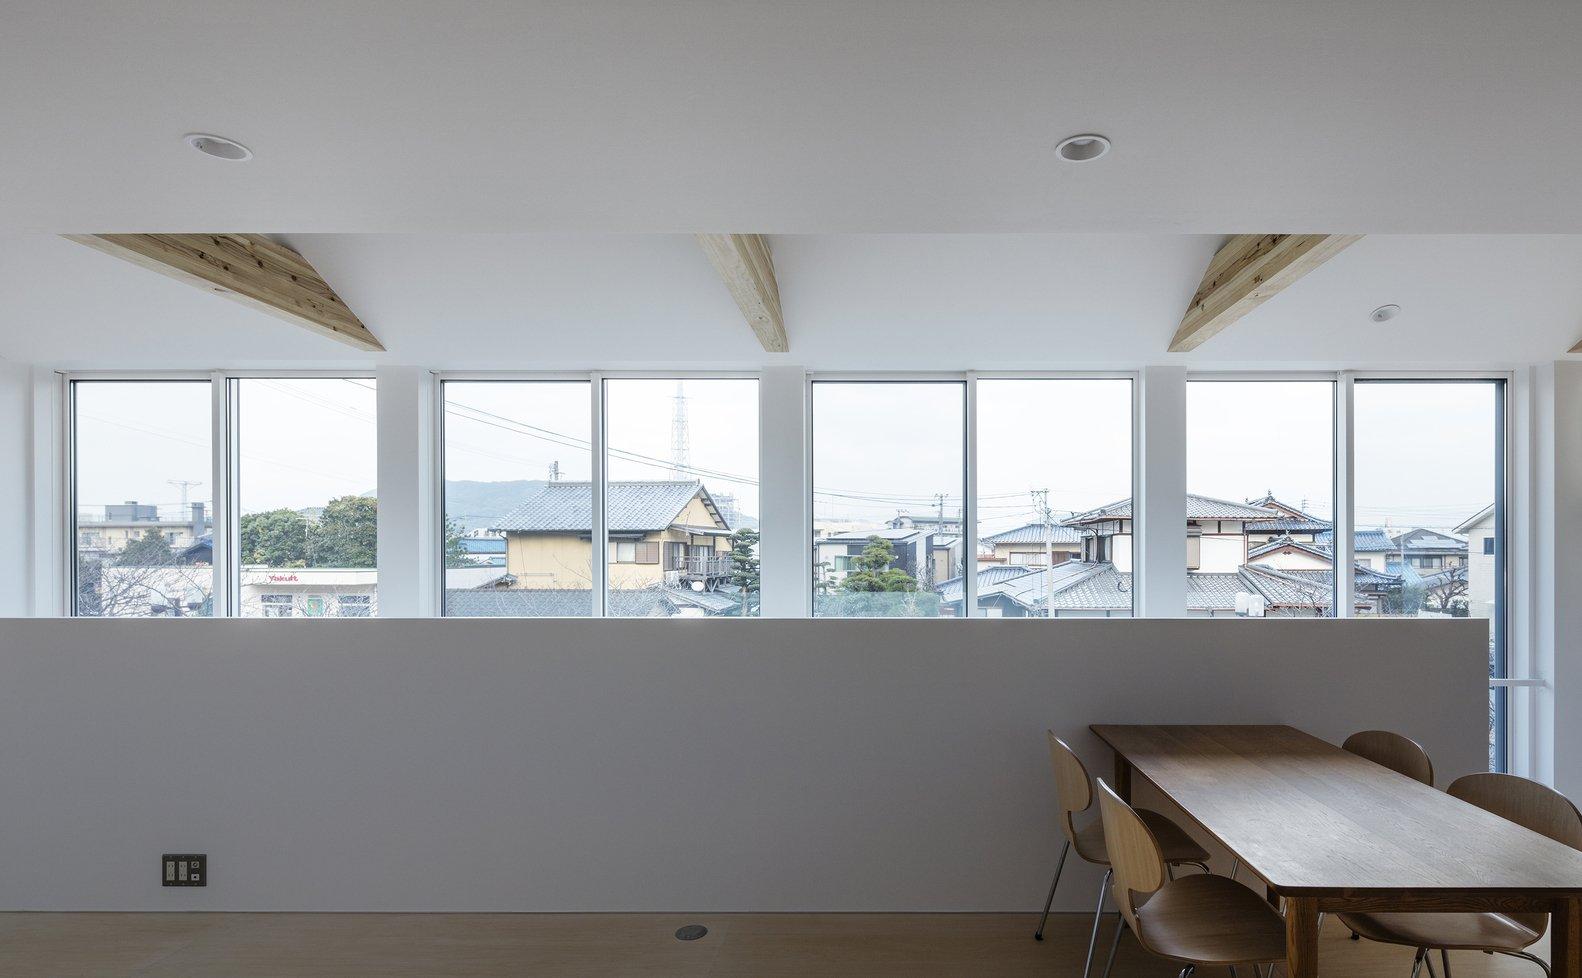 Photo 6 of 7 in House in Futako by Yabashi Architects & Associates